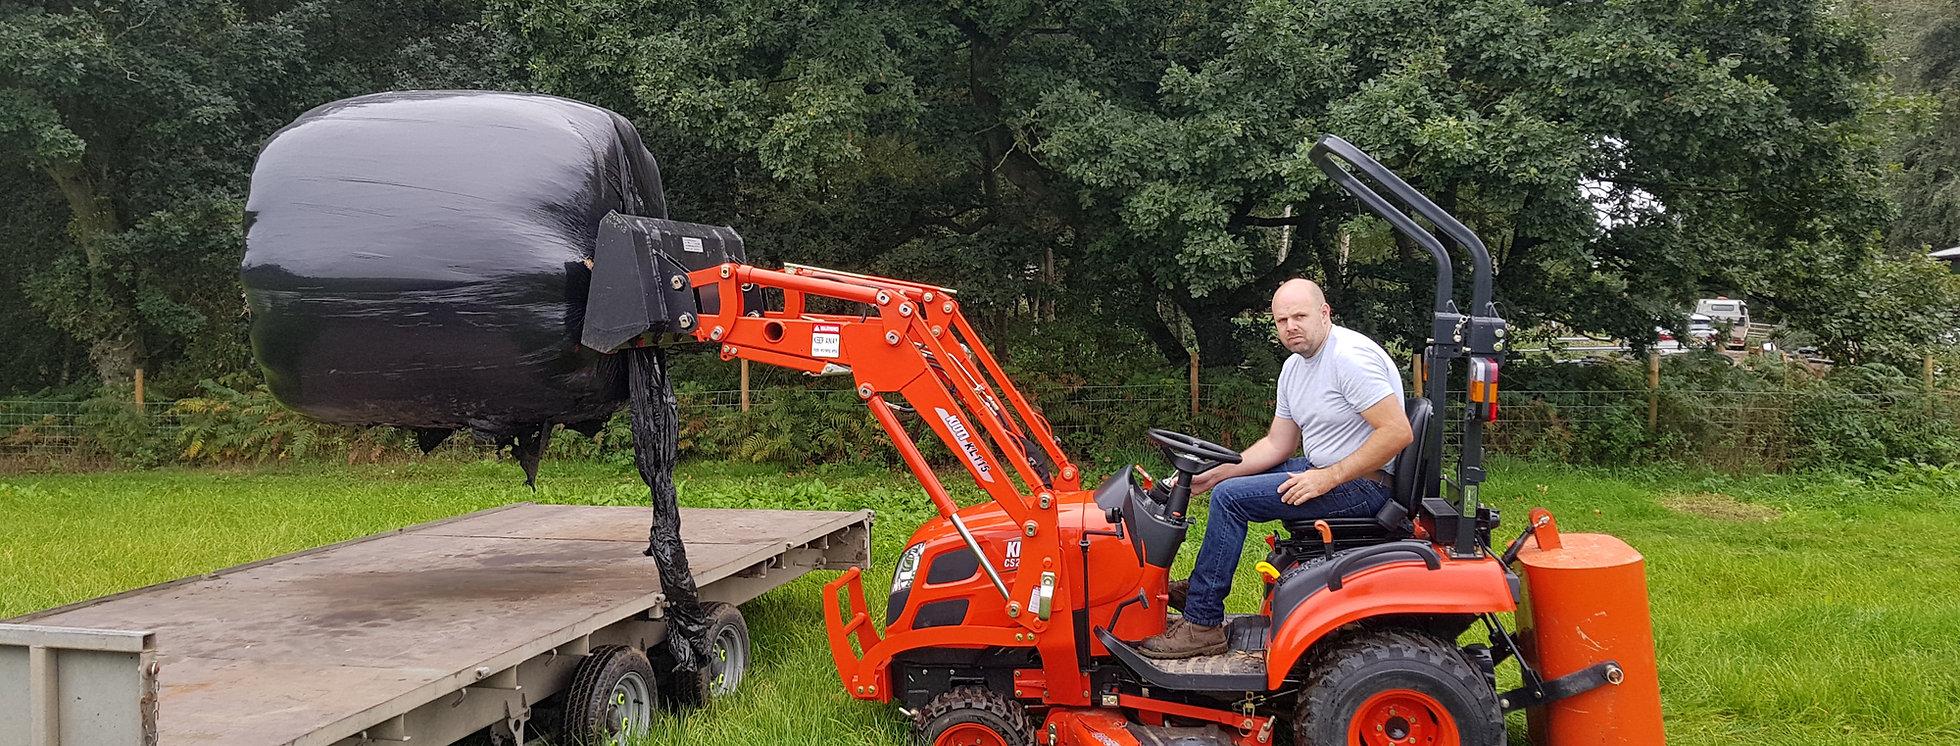 Kioti Tractor Front Loader Tractor